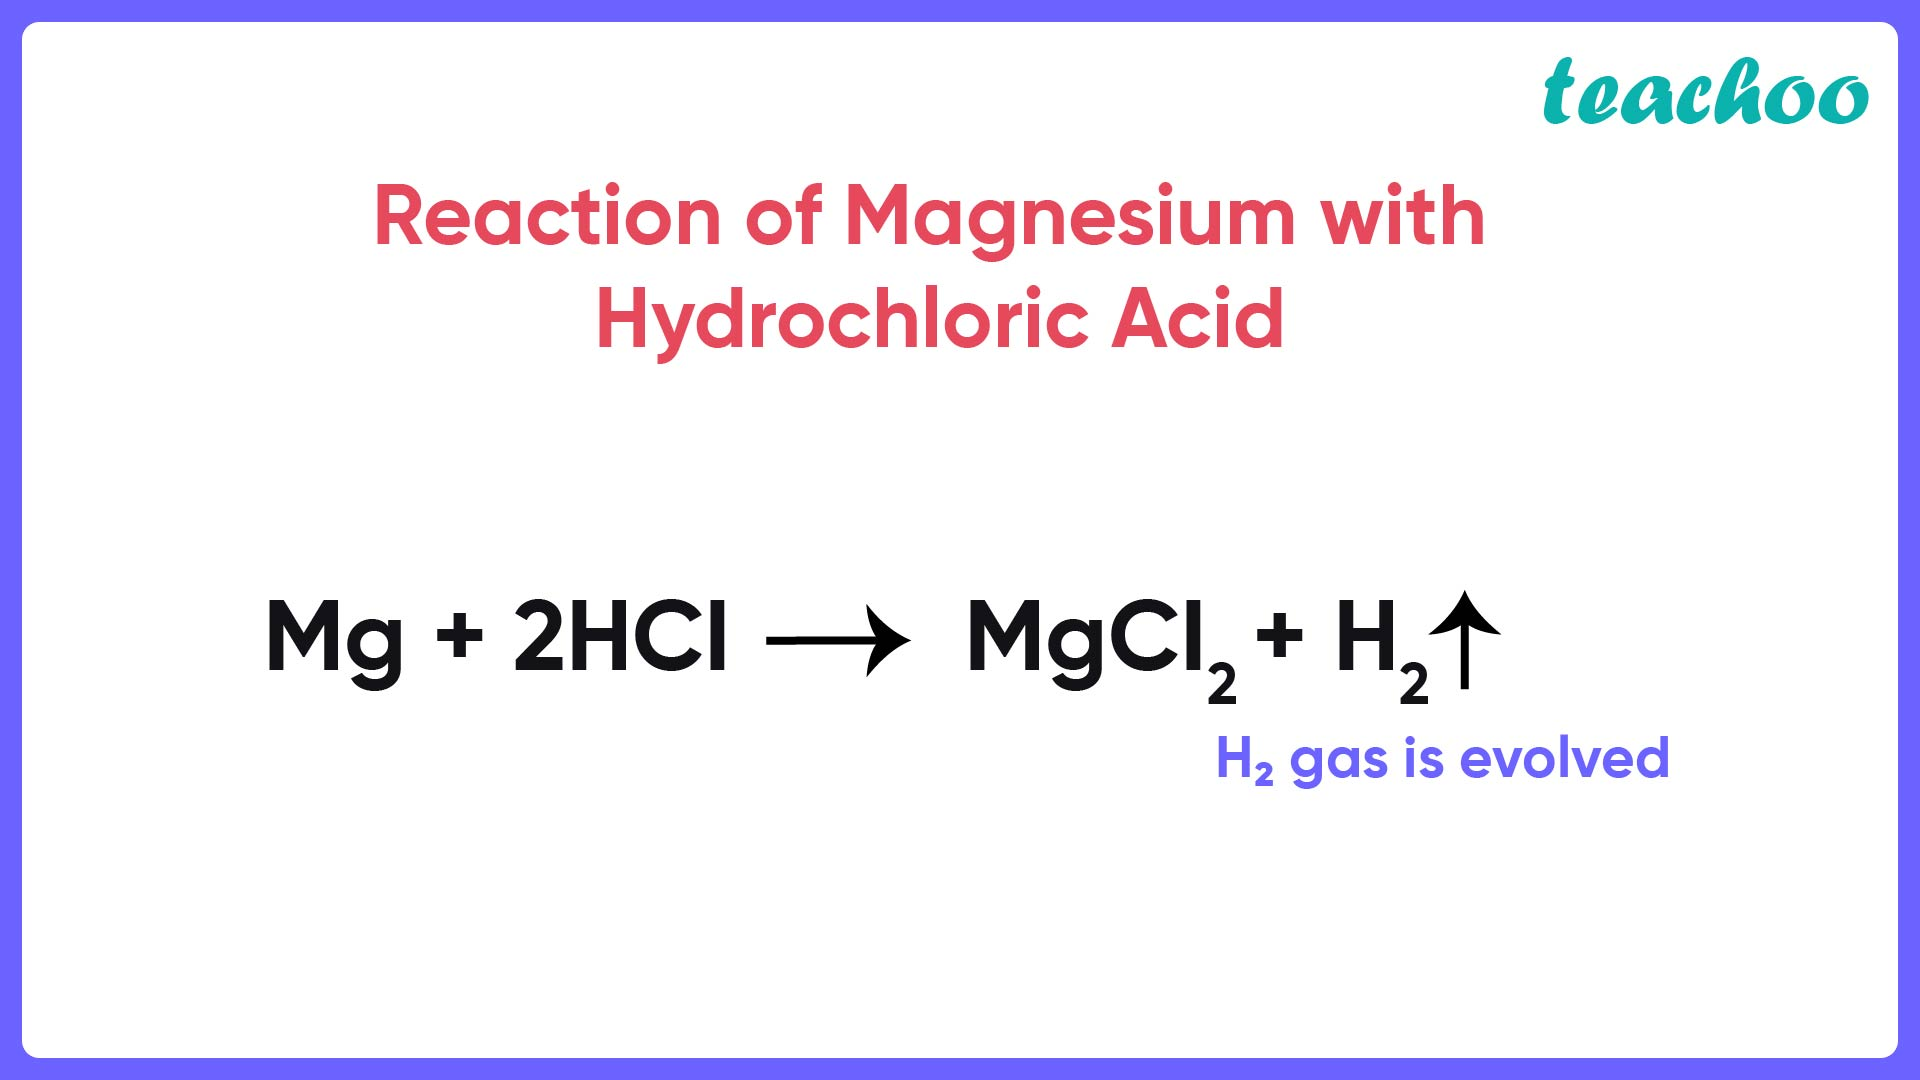 Reaction of Magnesium with Hydrochloric Acid - Teachoo-01.jpg